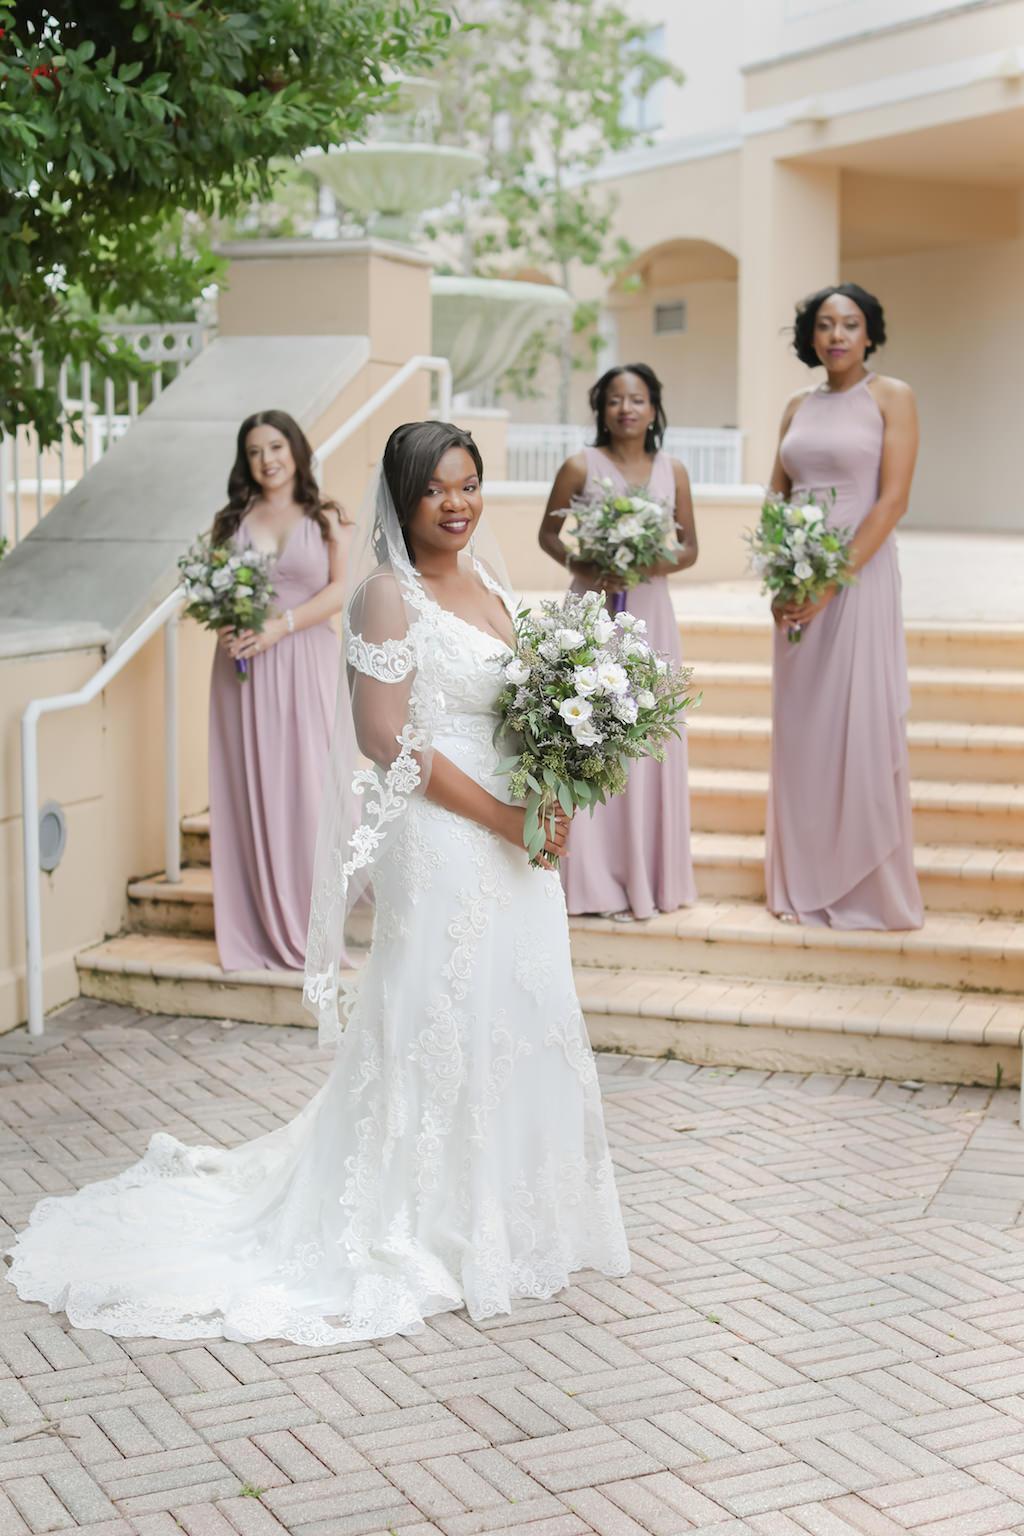 Bride and Bridesmaids Outdoor Wedding Portrait | Largo Wedding Venue The Bayou Club | Tampa Wedding Photographer Lifelong Photography Studio